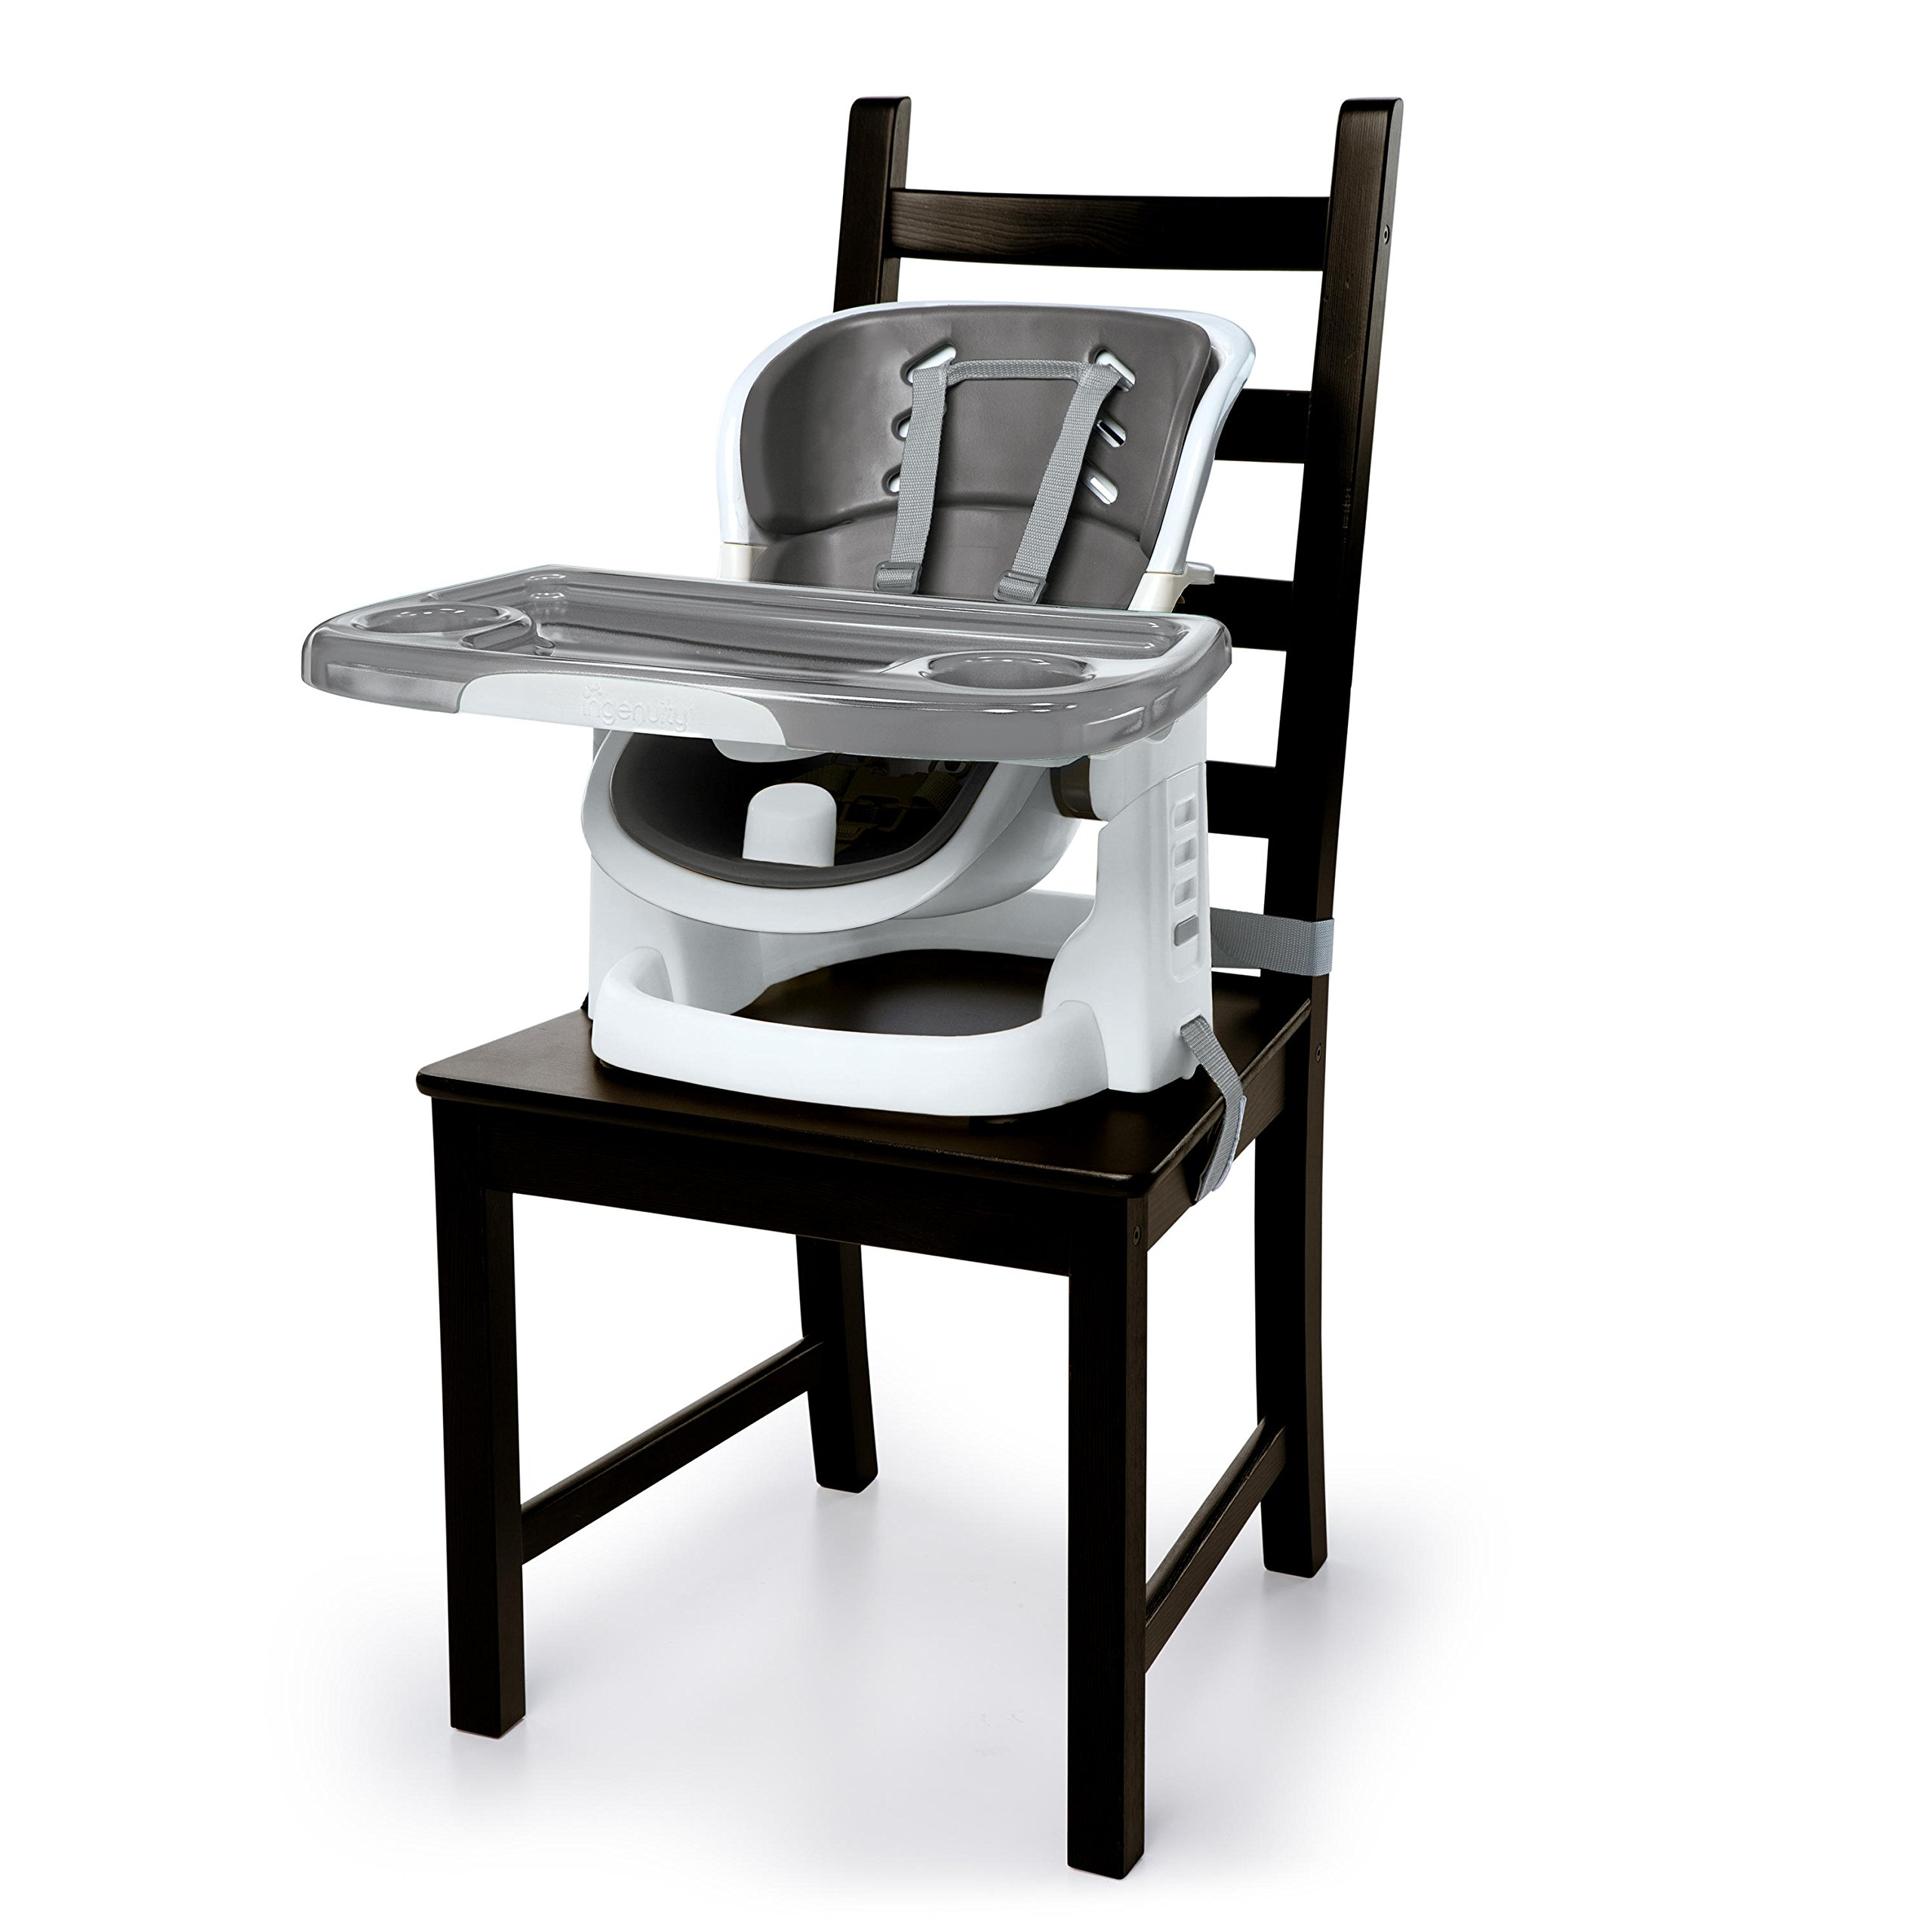 Ingenuity SmartClean ChairMate High Chair - Slate by Ingenuity